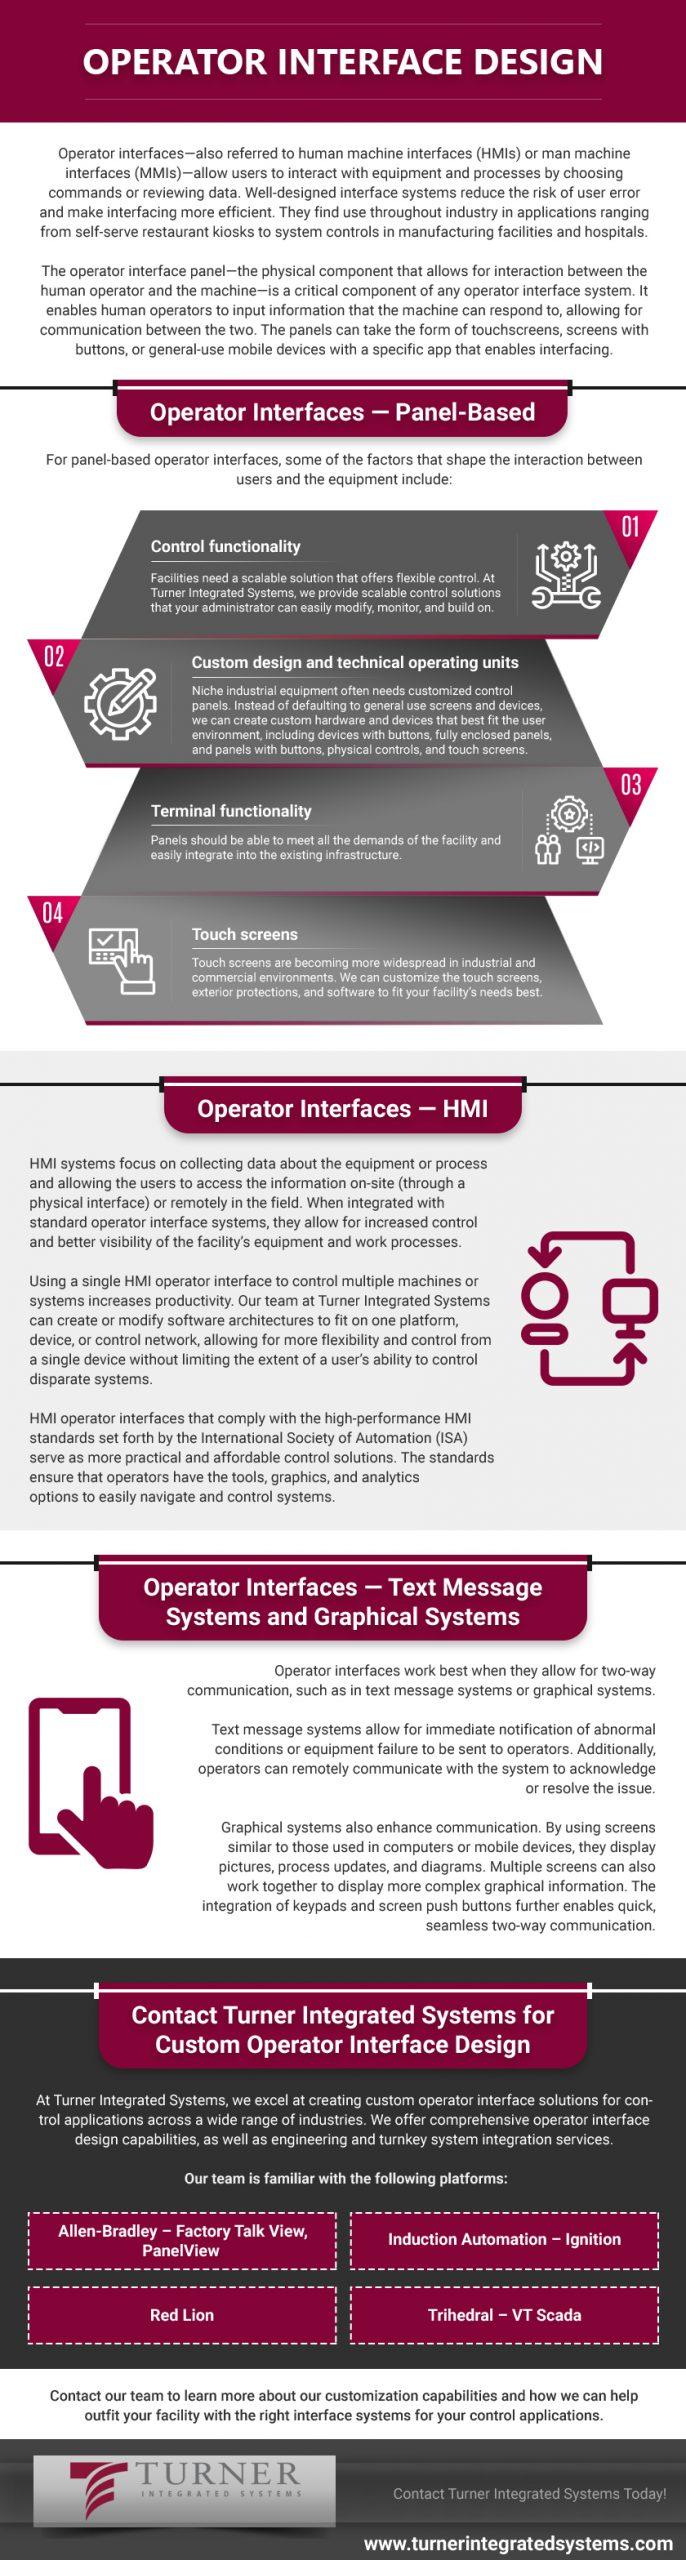 operator-interface-design